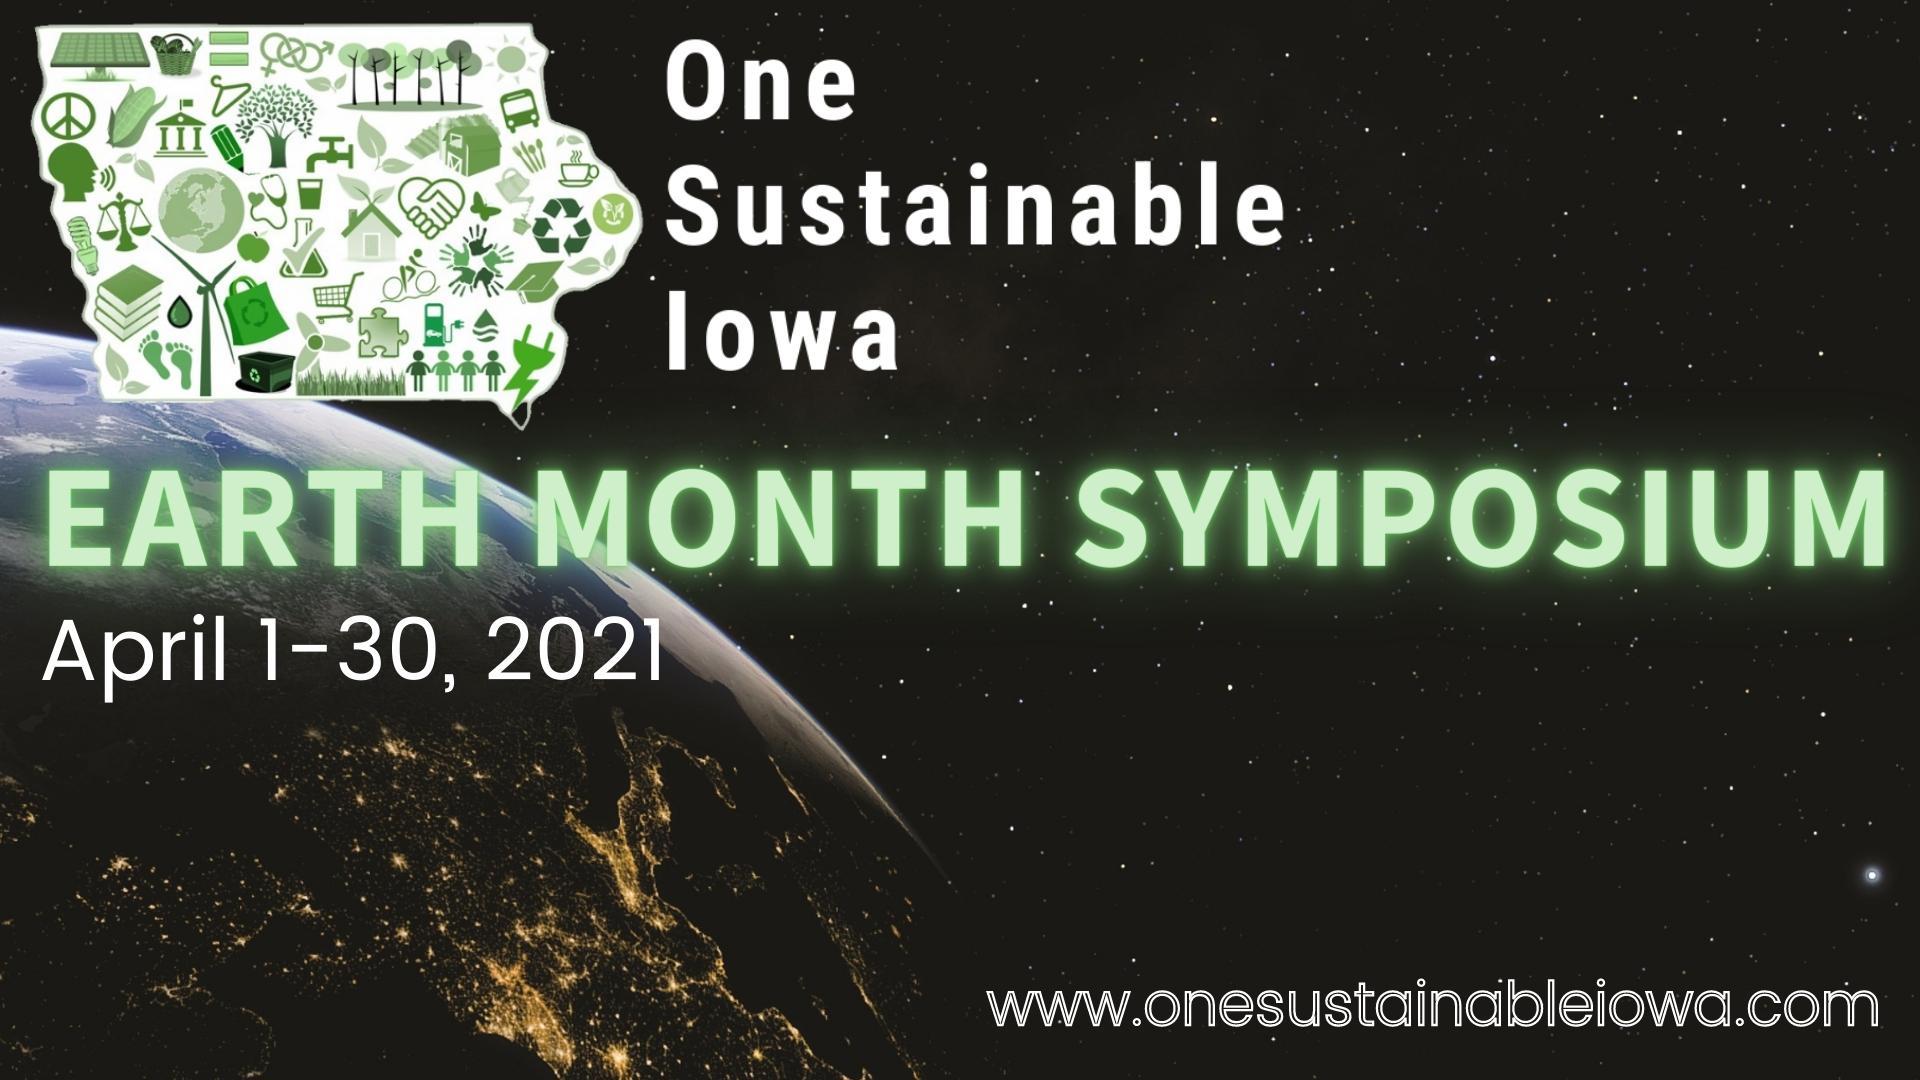 One Sustainable Iowa Symposium